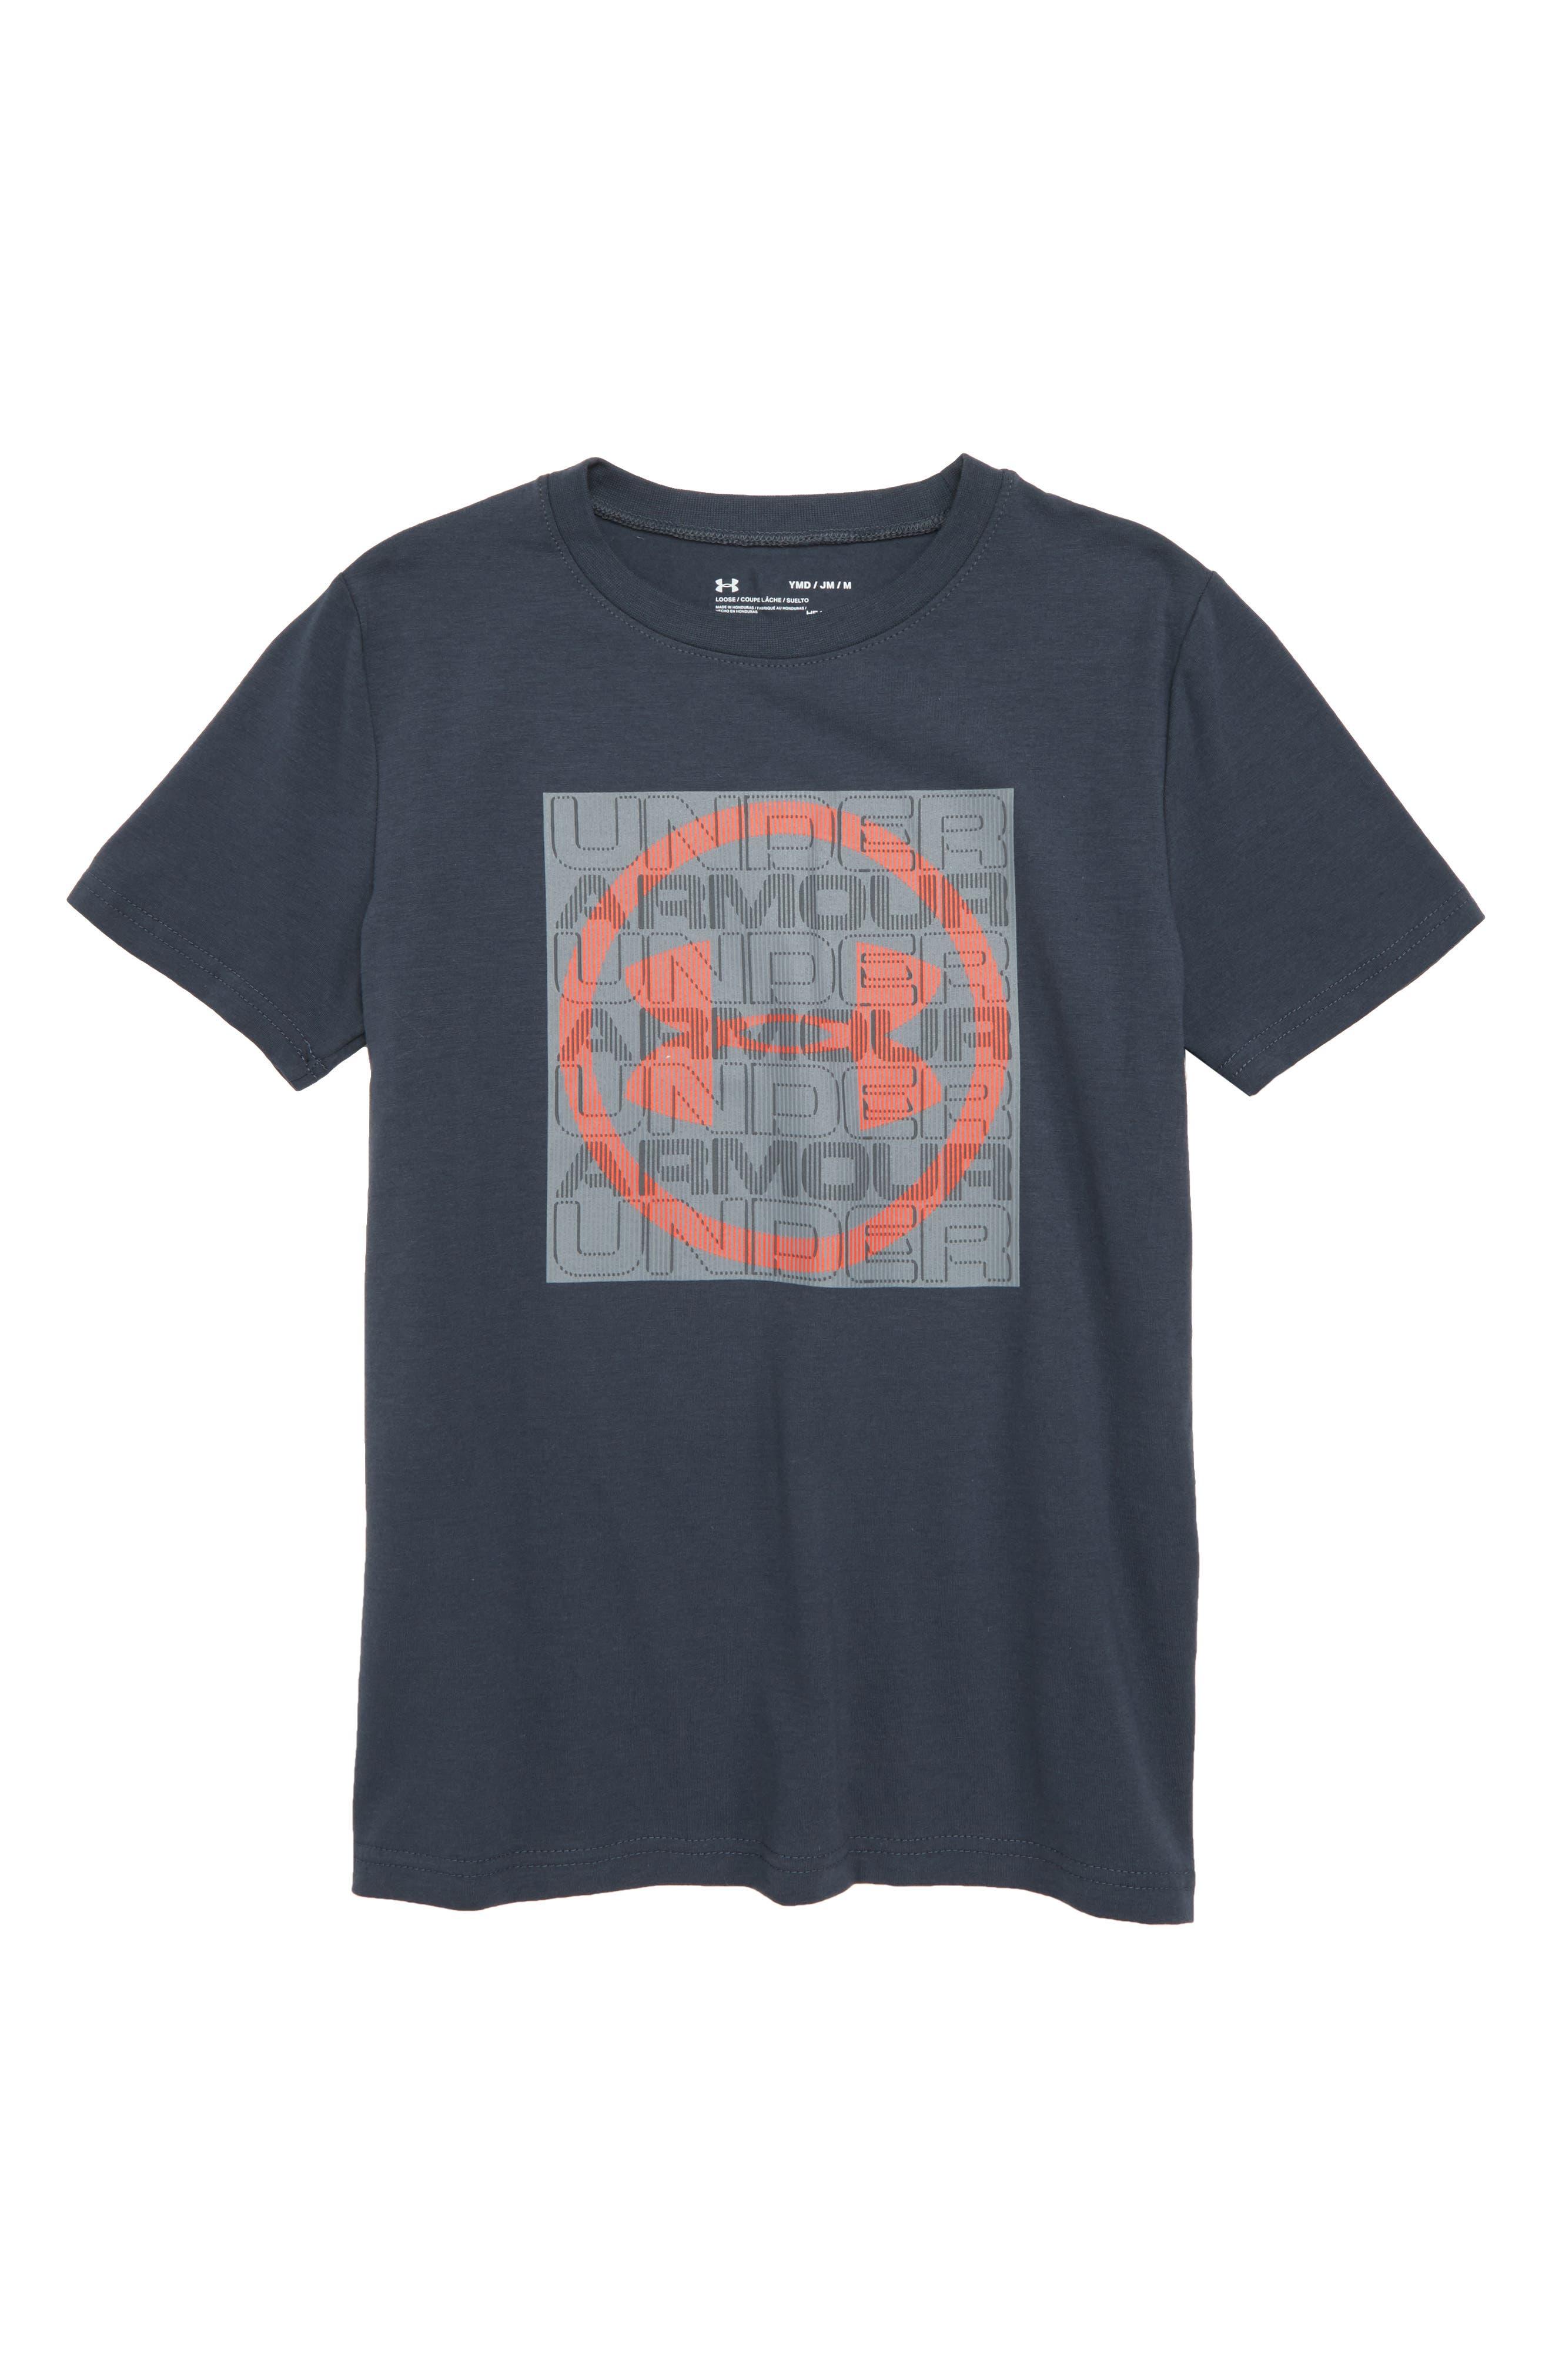 Visualogo T-Shirt,                         Main,                         color, 020